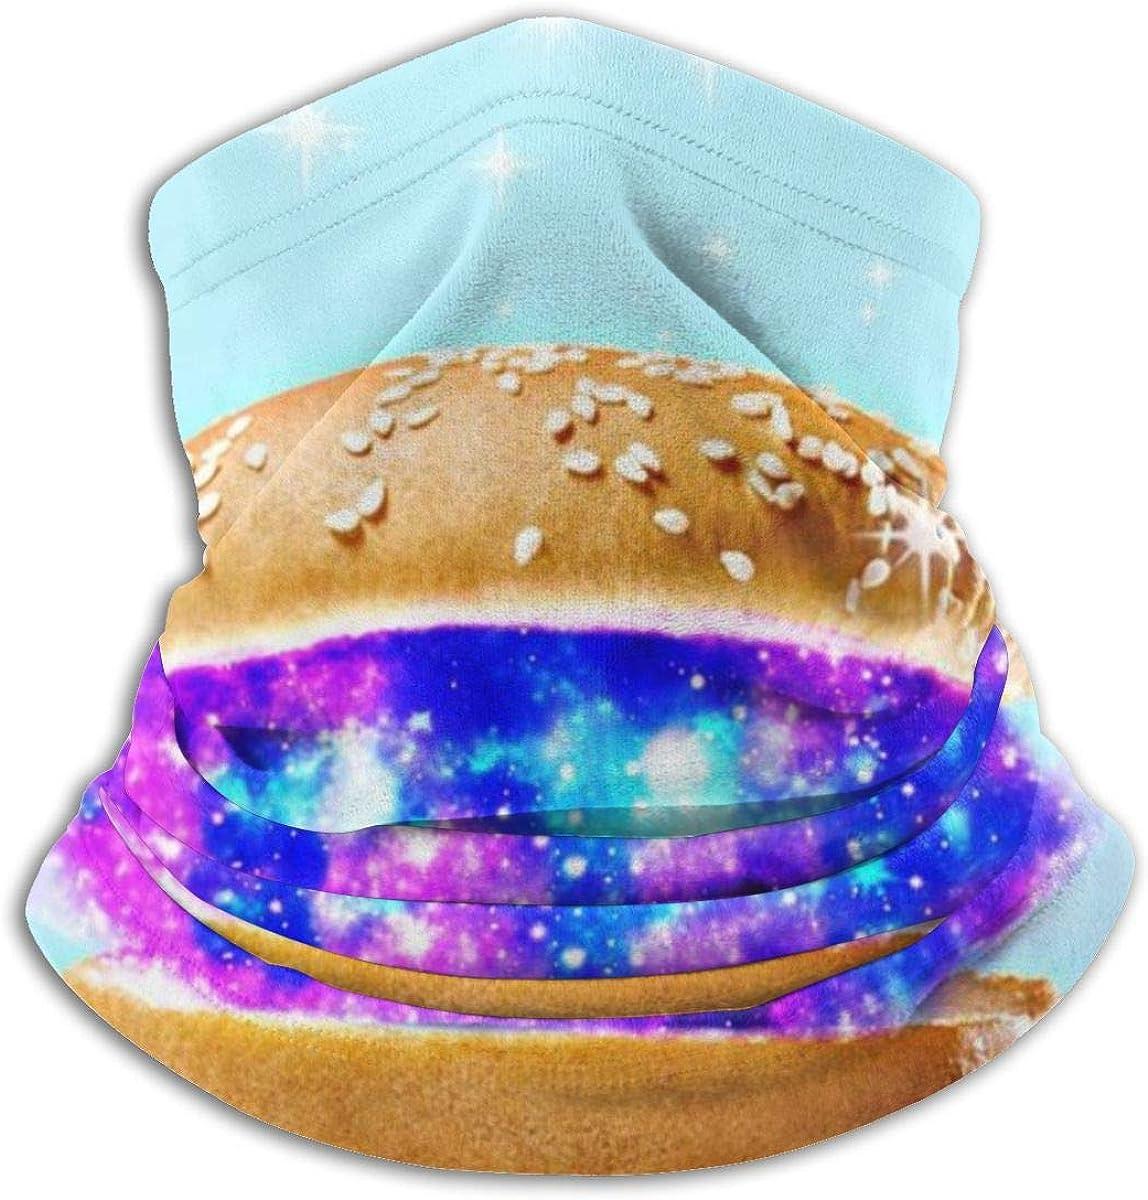 CLERO& Scarf Fleece Neck Warmer Galaxy Hamburger Stars Windproof Outdoor Headwear Comfortable Neck Gaiter Warmer Face Mask for Cold Weather Winter Outdoor Sports